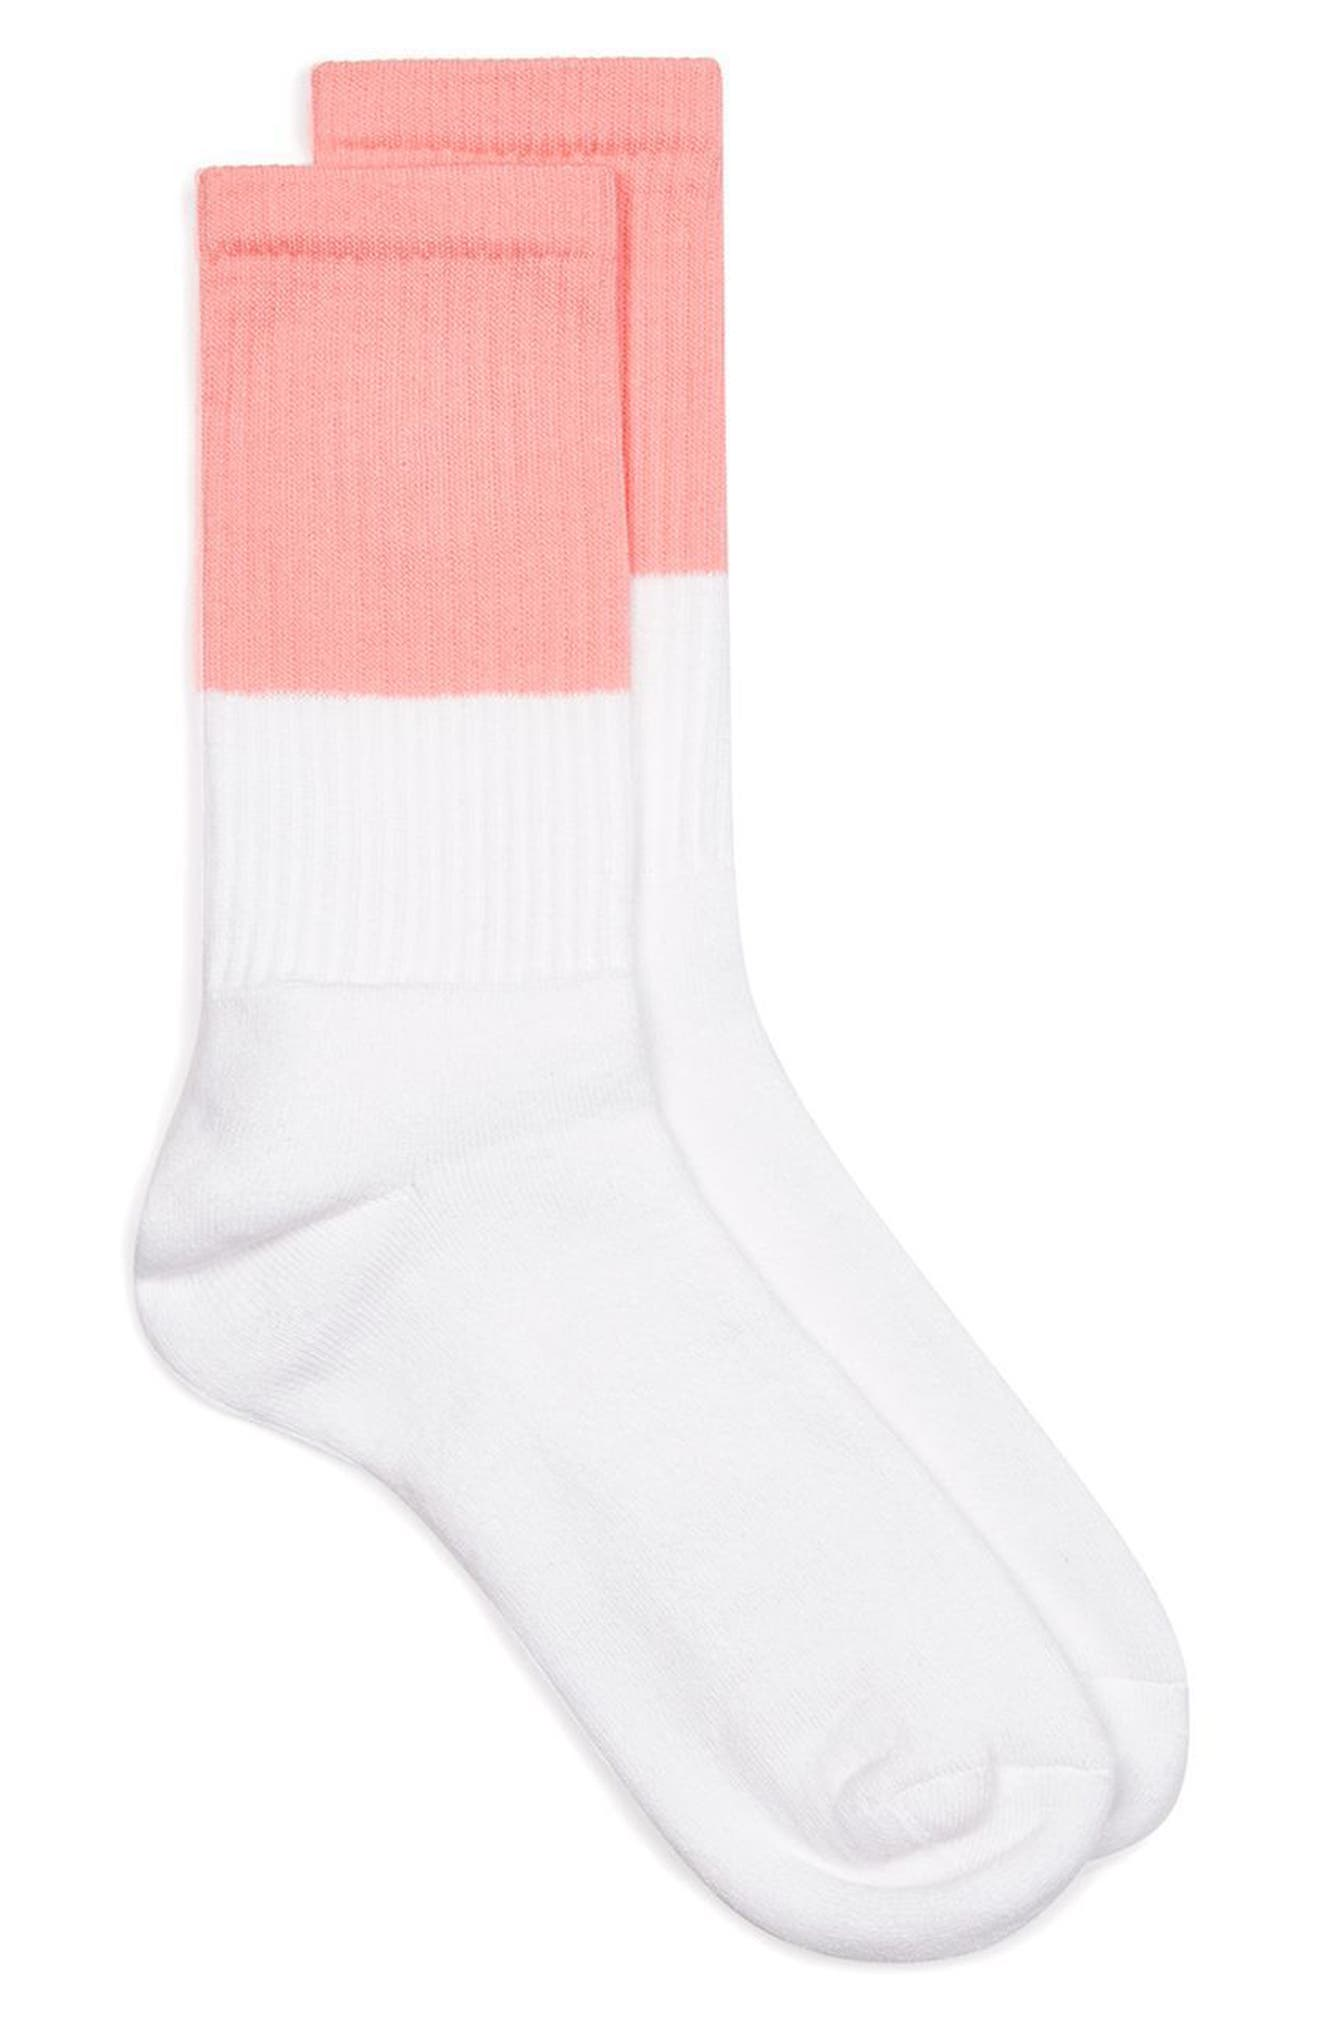 Topman Colorblock Tube Socks